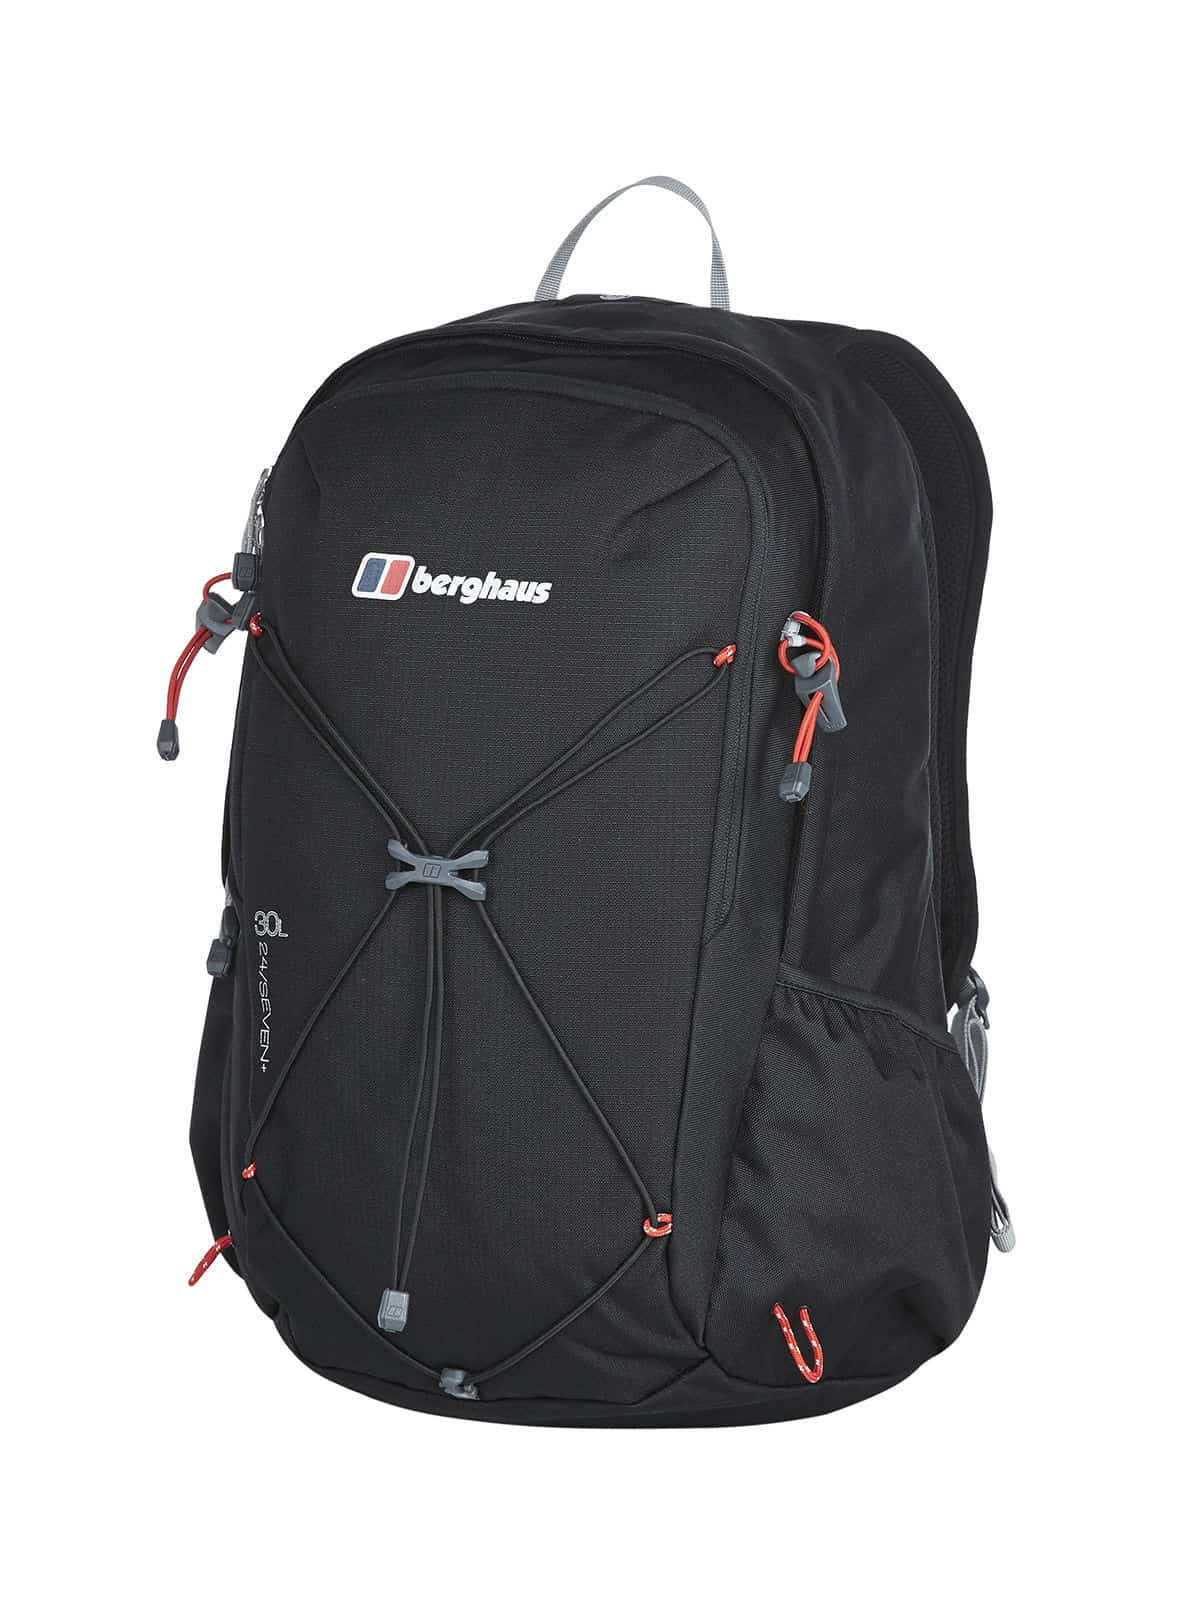 Berghaus Twentyfourseven Bag Promotional Products